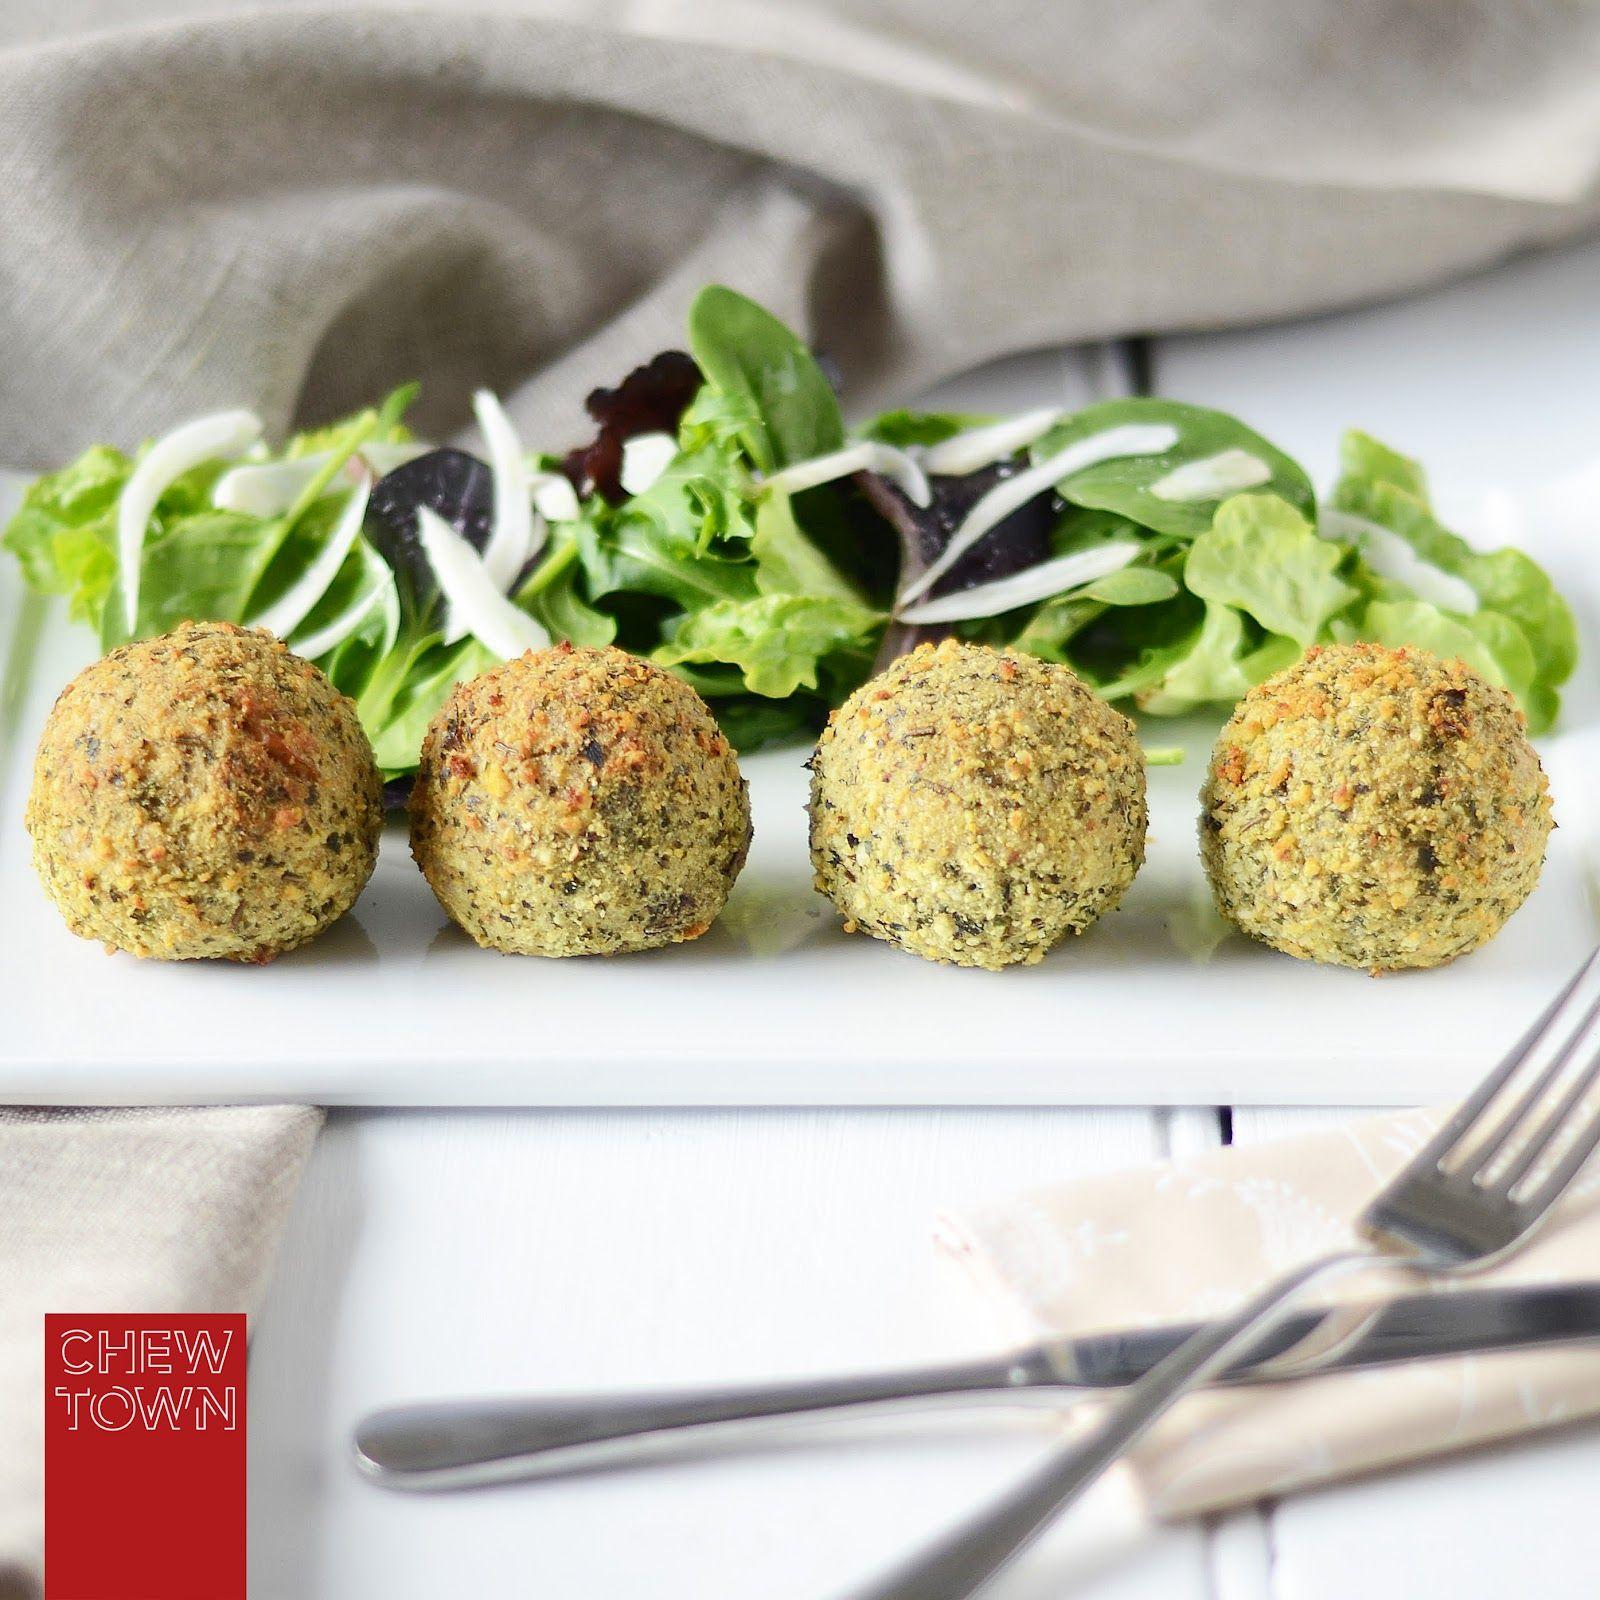 Baked Mushroom Arancini (Risotto Balls) {Via Chew Town}